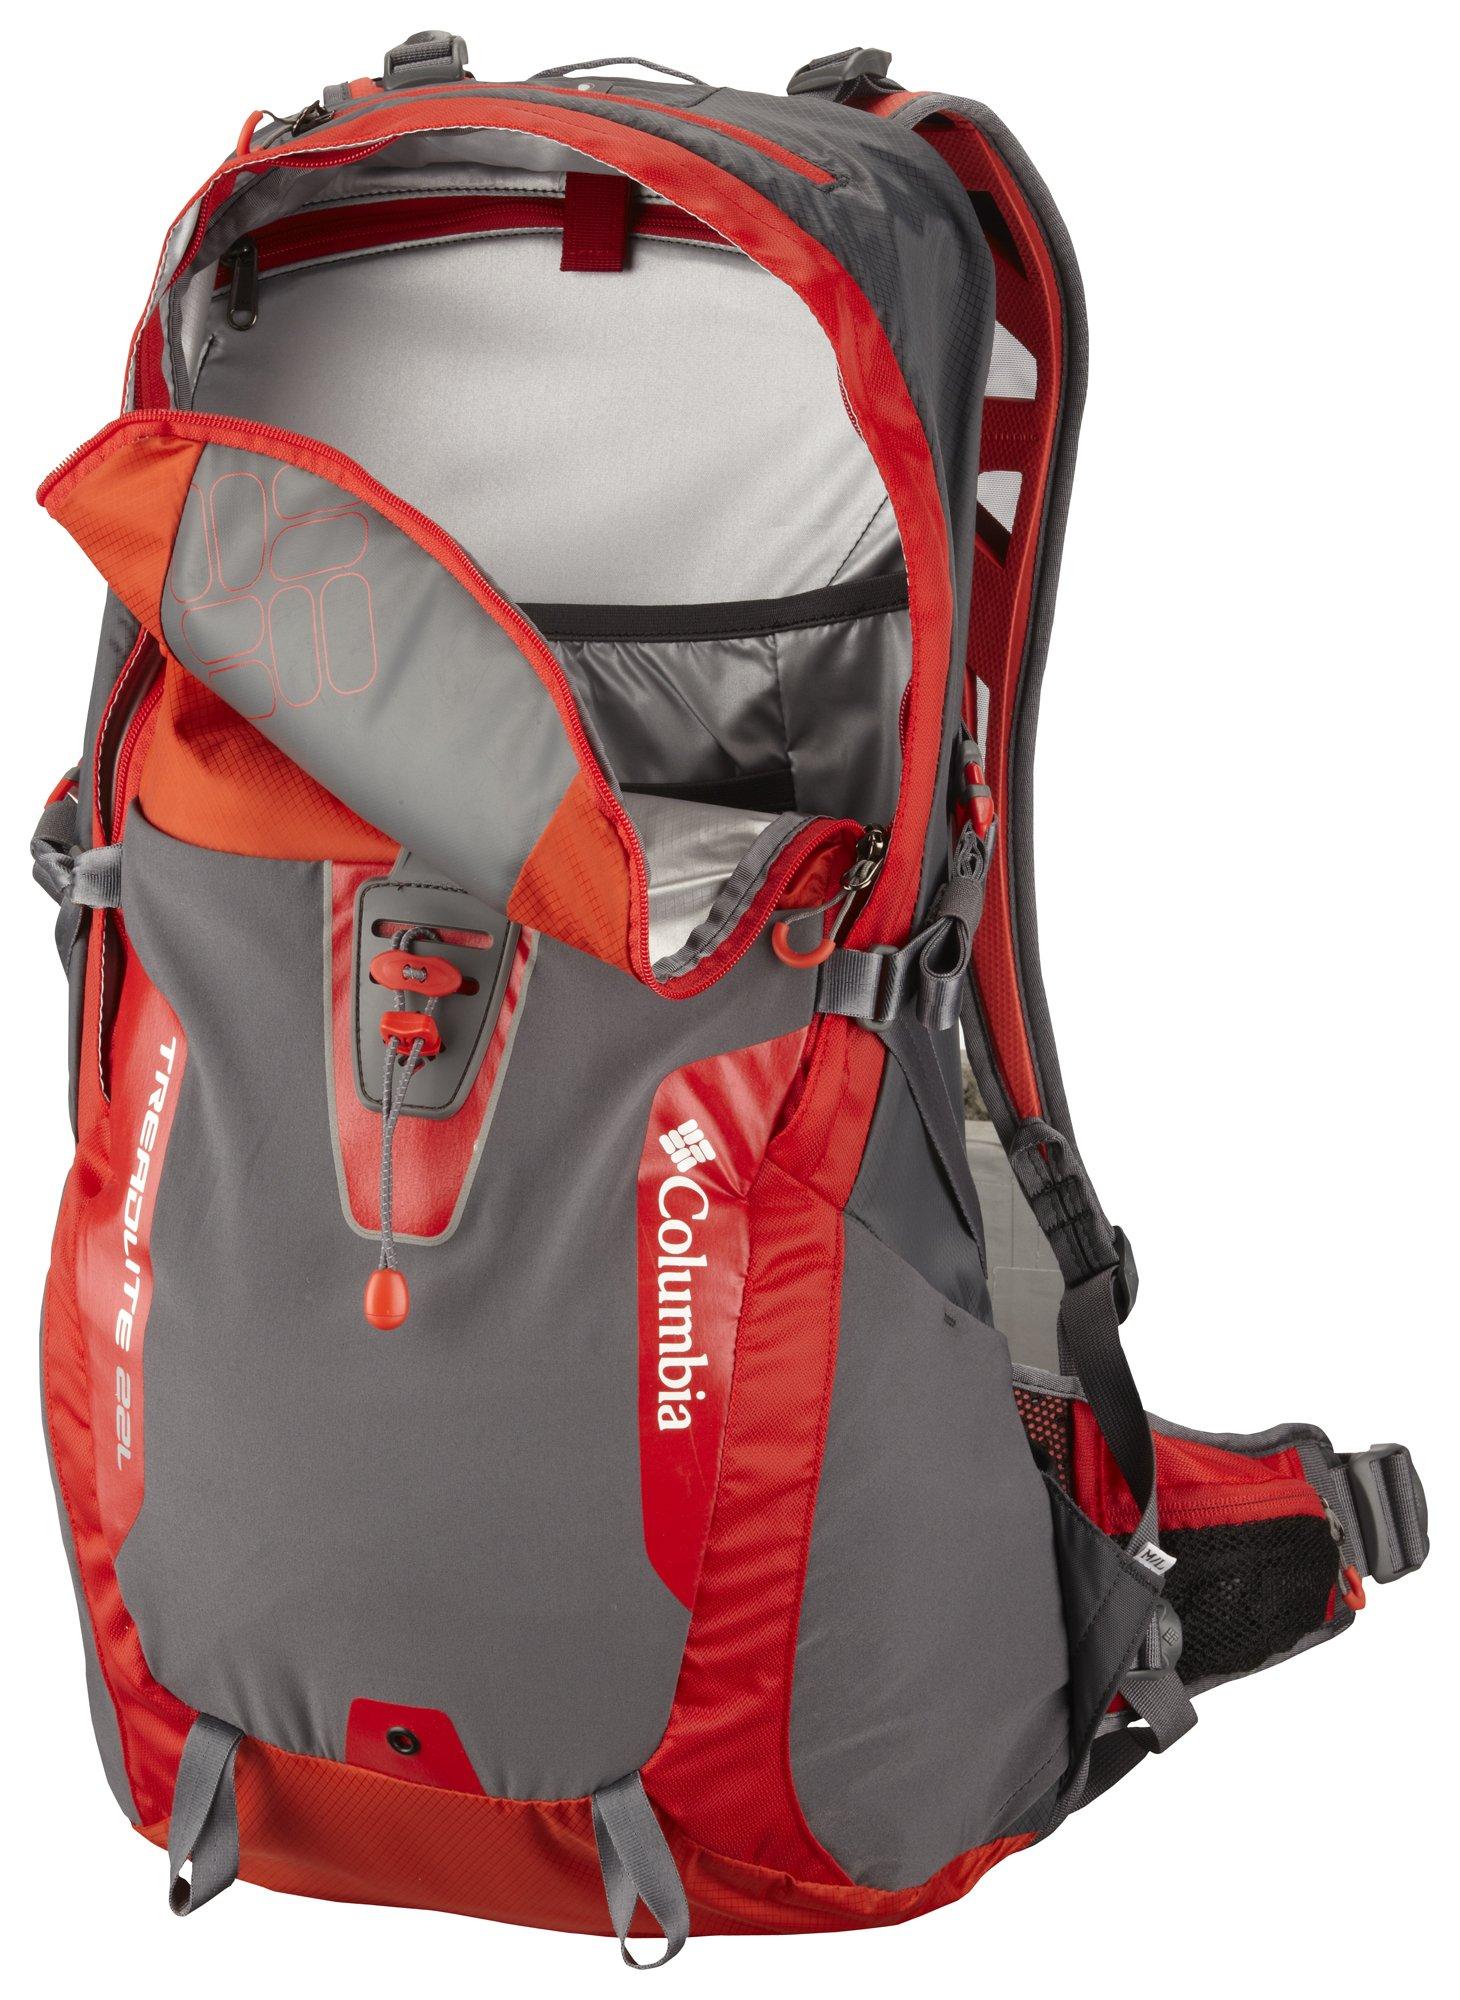 Columbia Treadlite 22 Backpack